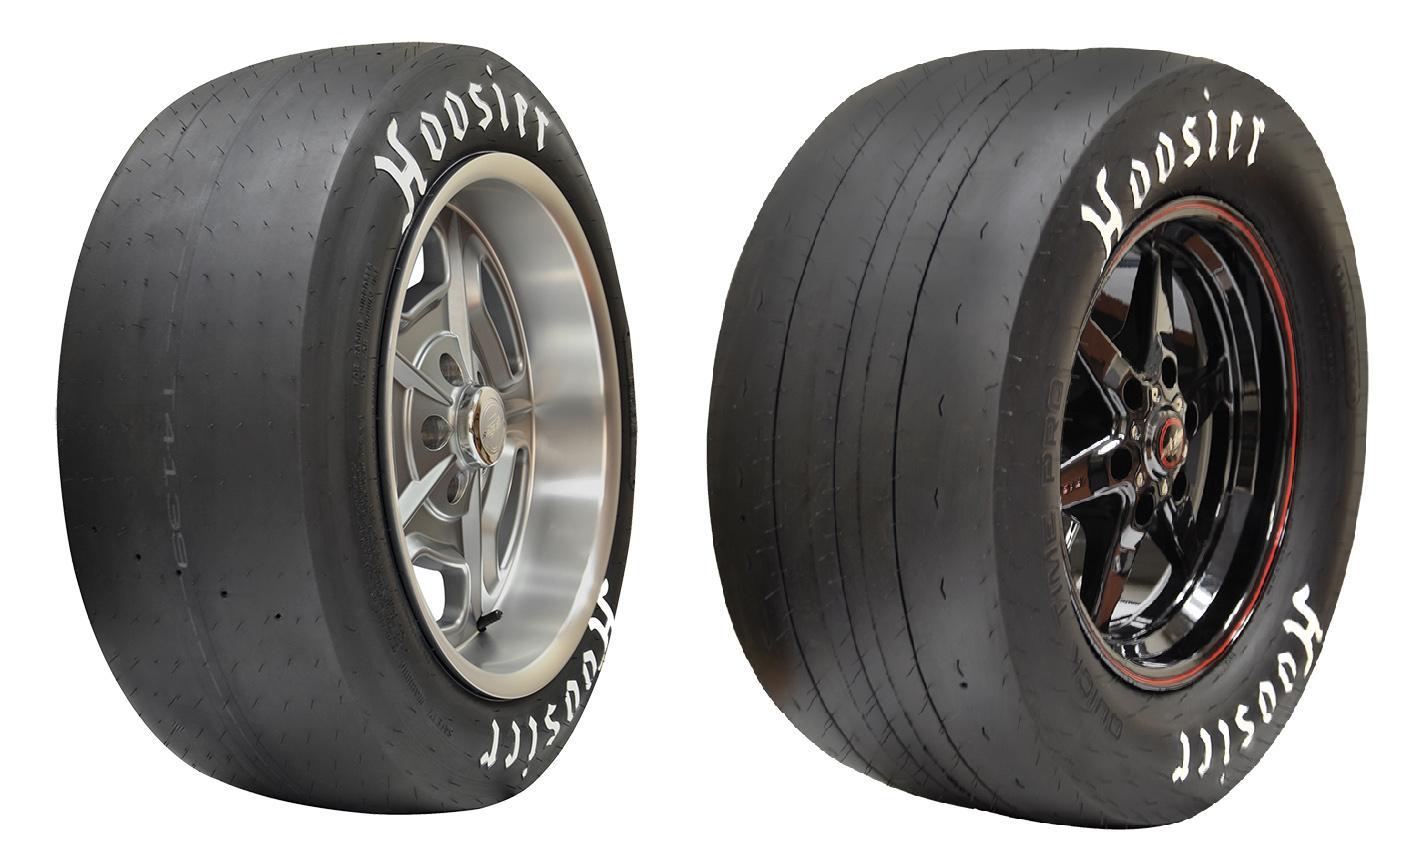 Hoosier Racing Tire расширяет ассортимент шин для дрэг-рейсинга